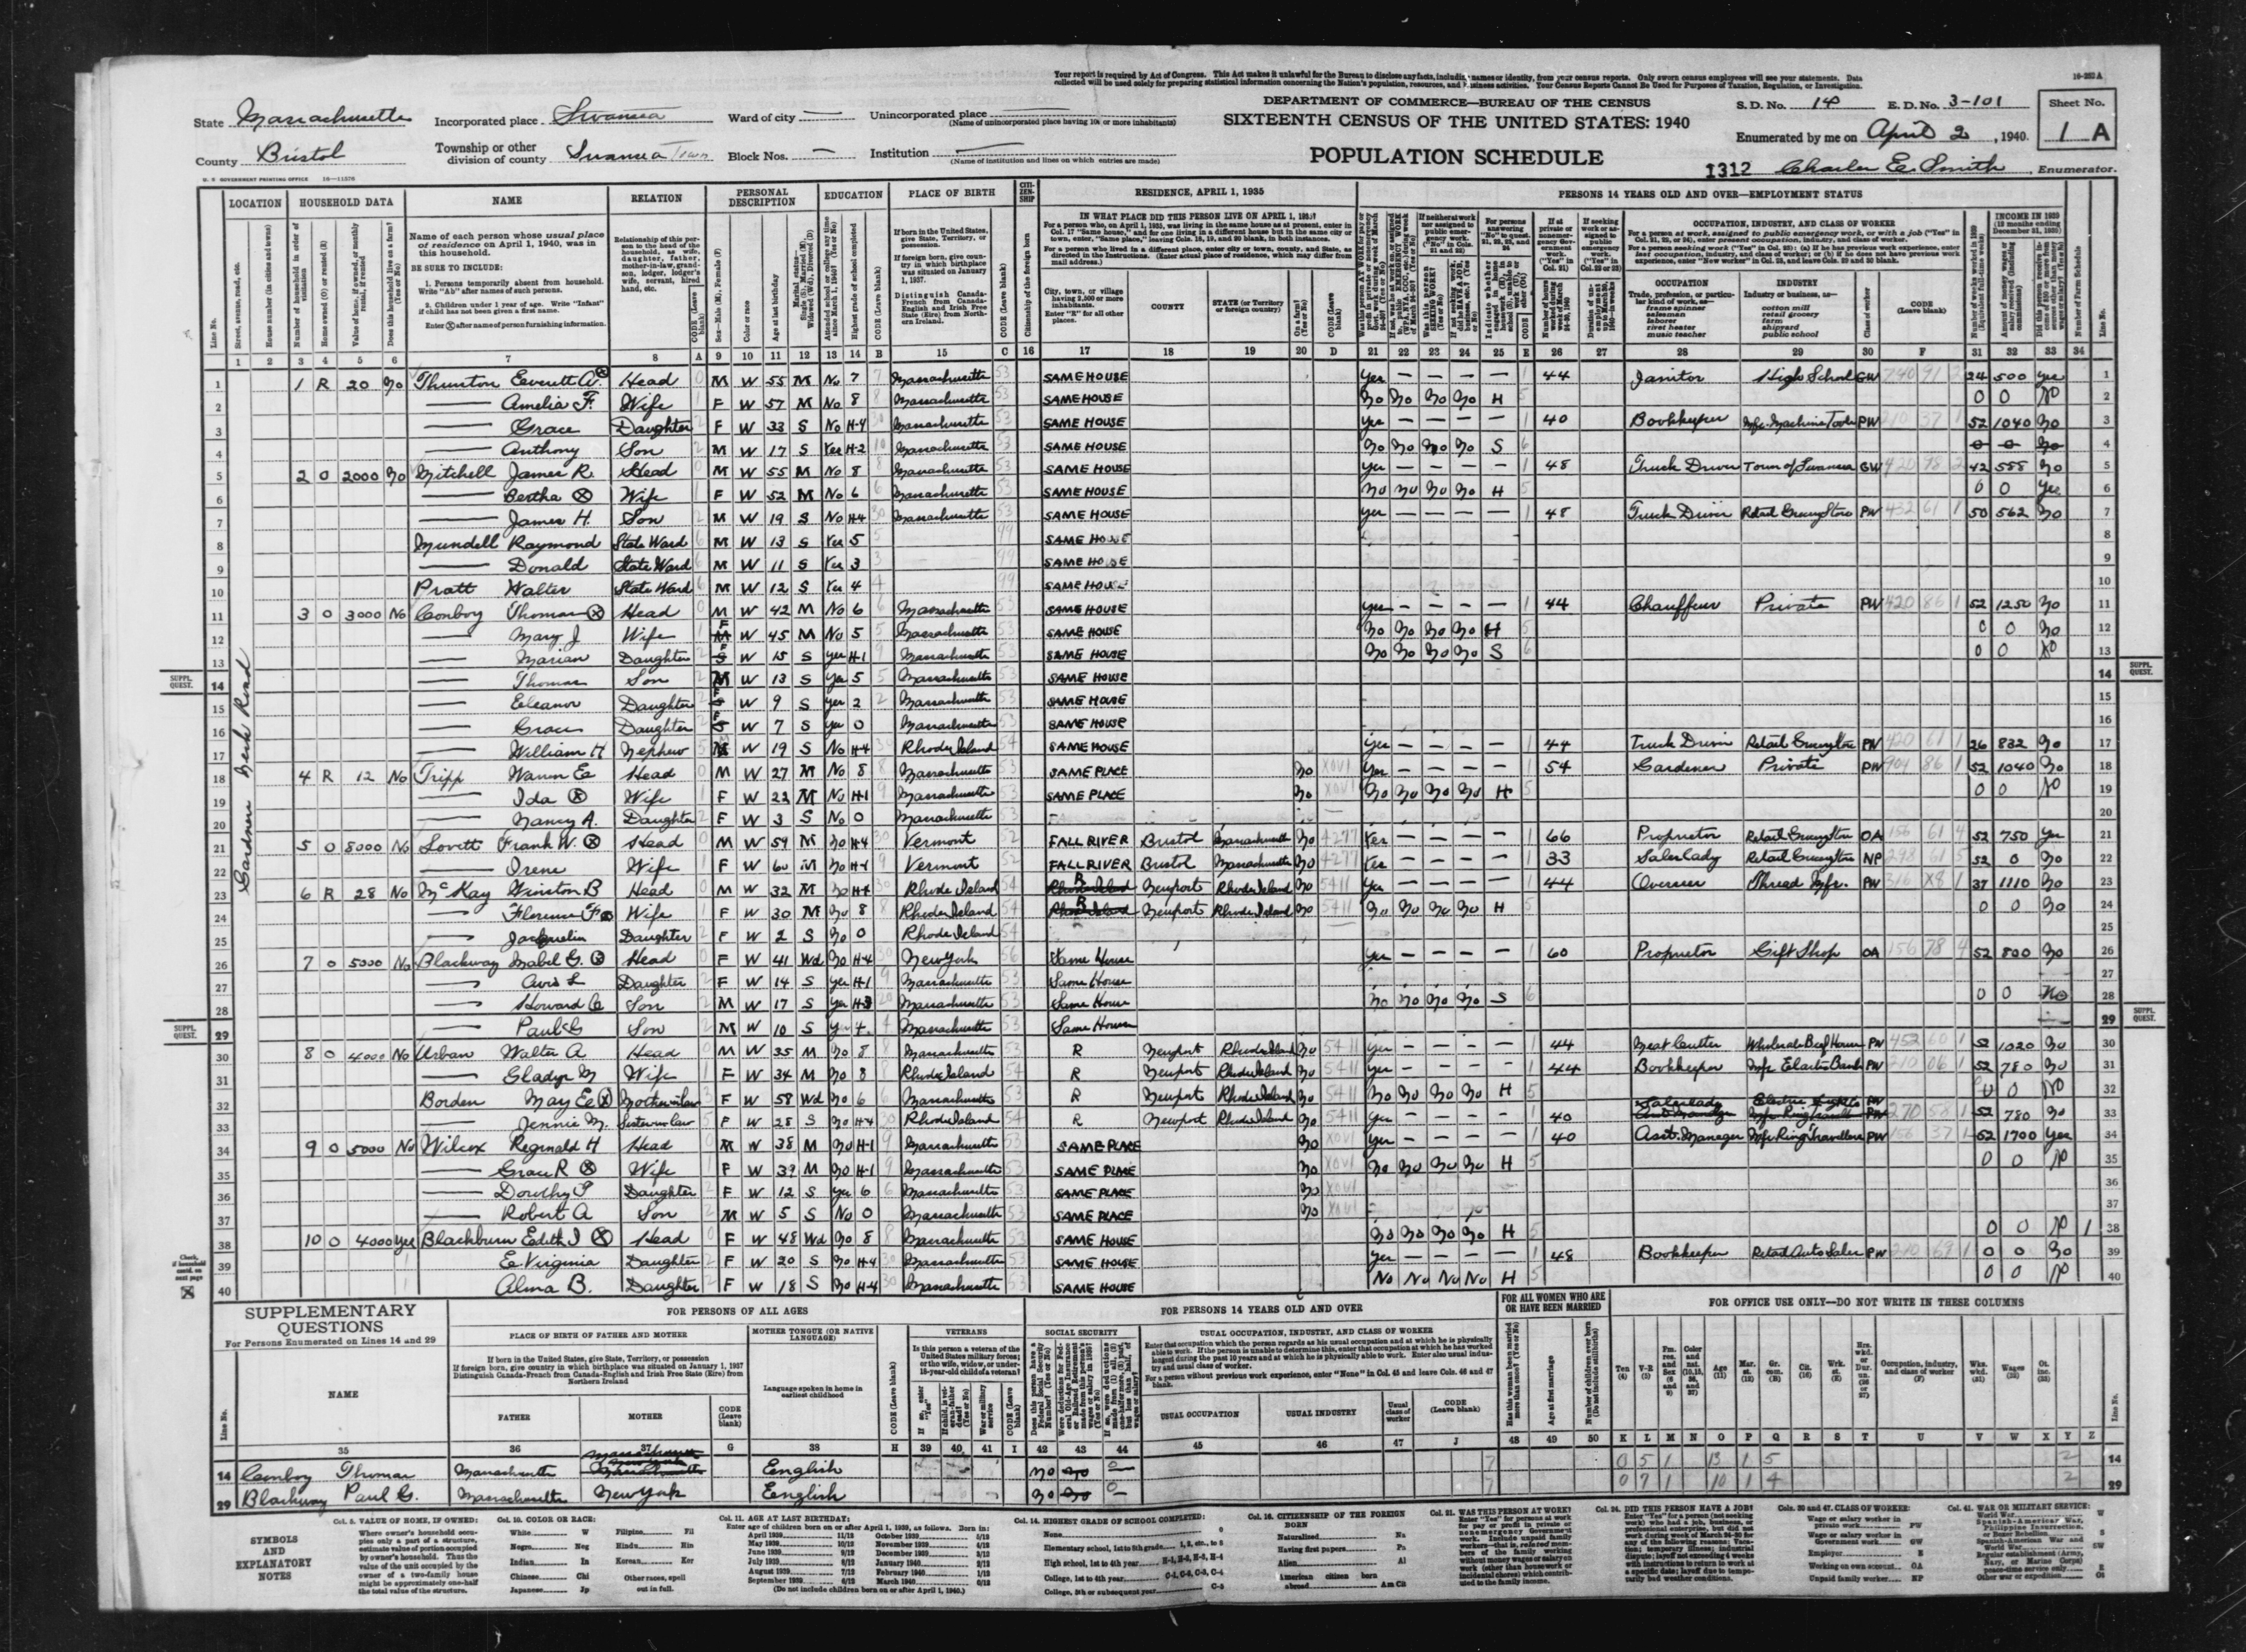 1940 Census Population Schedules - Massachusetts - Bristol County - ED 3-101